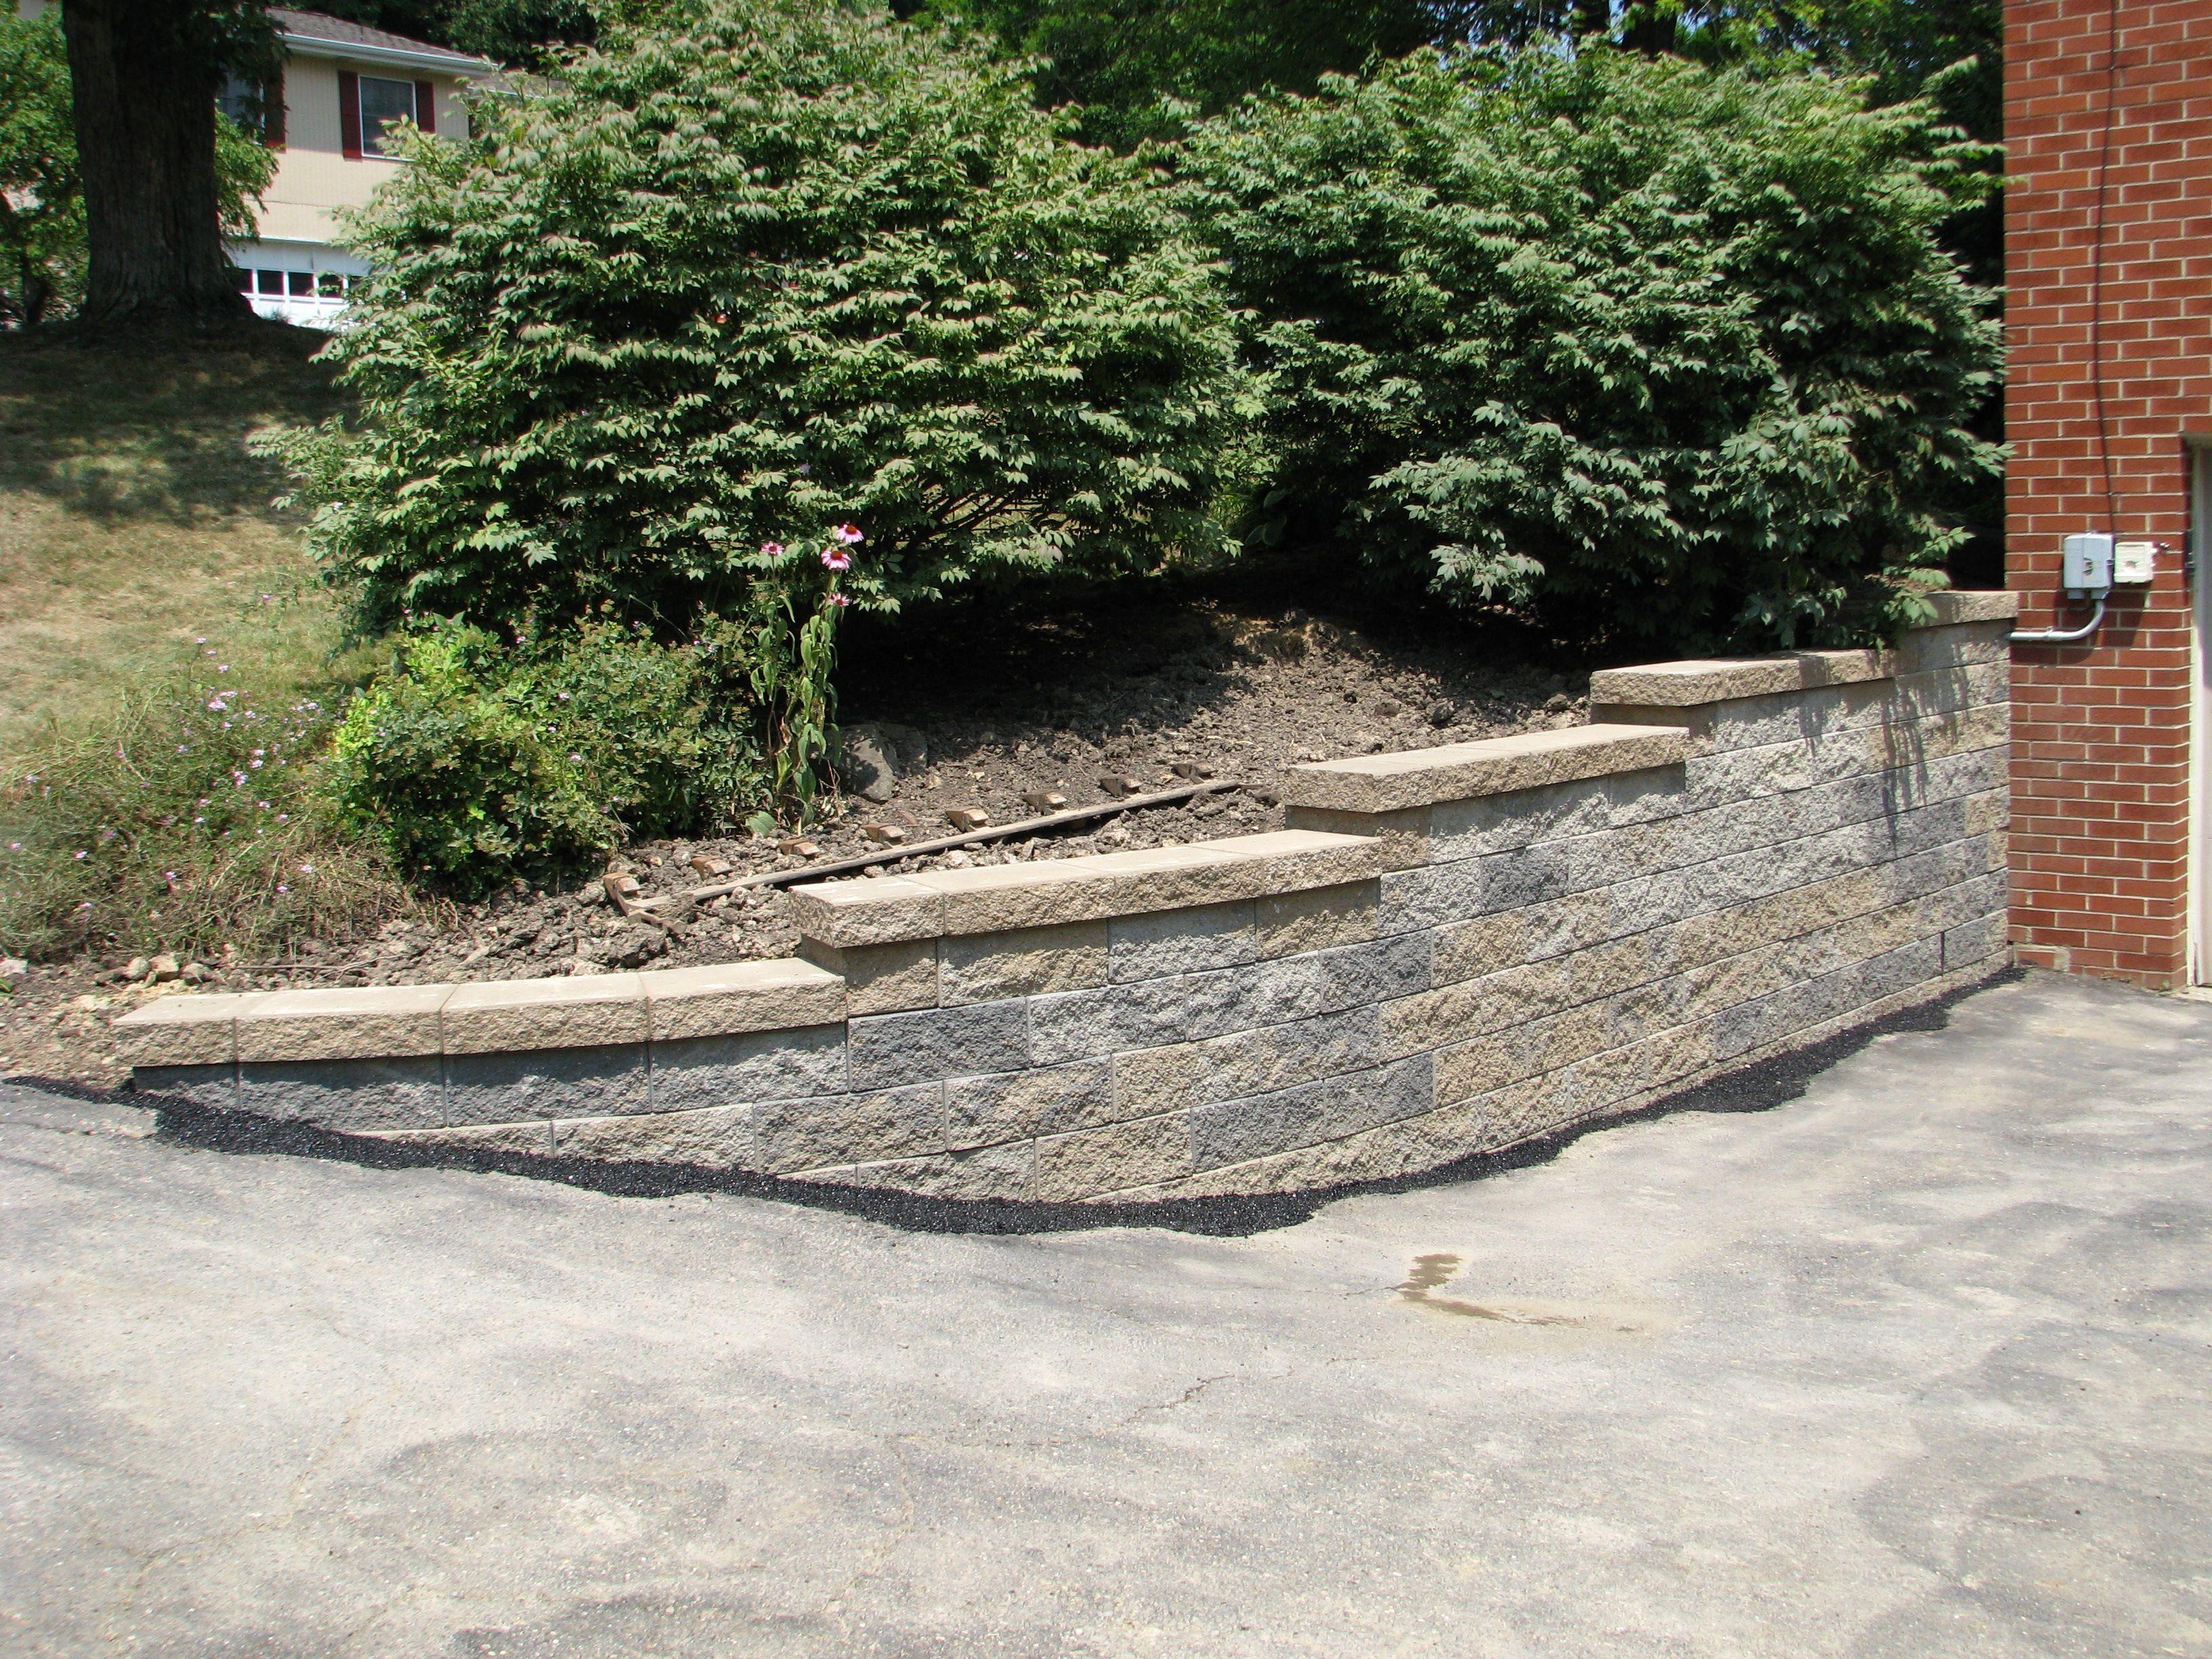 Small Driveway Retaining Wall Retaining Wall Stone Wall Front Yard